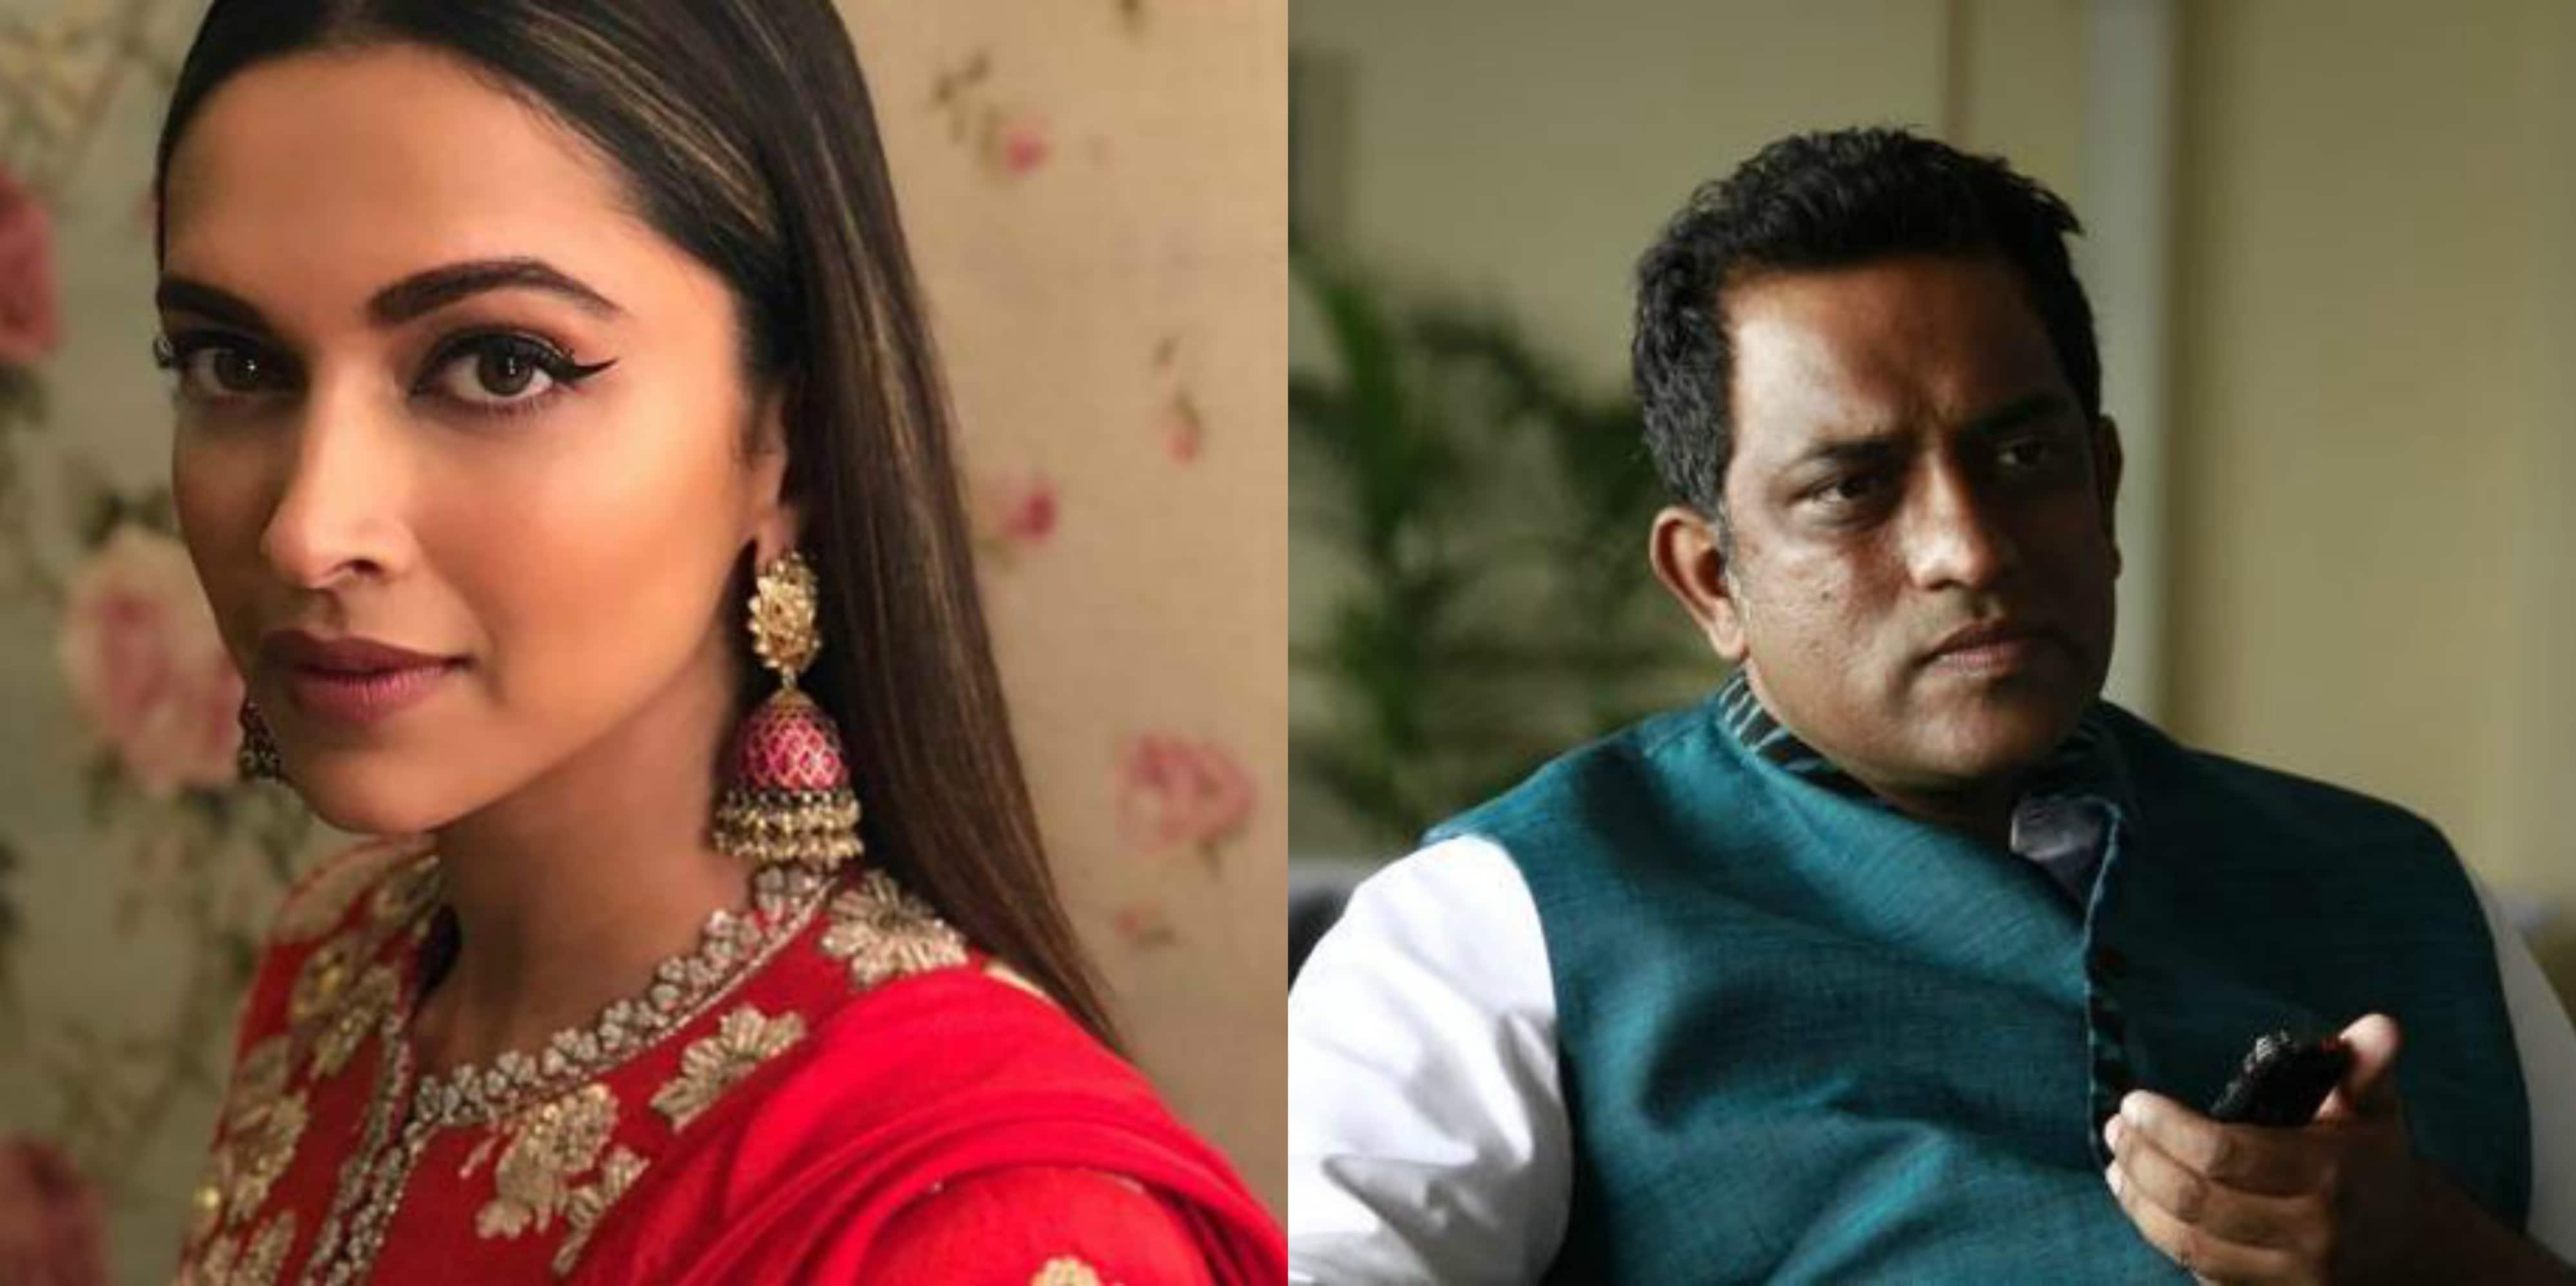 Deepika Padukone To Star In Anurag Basu's Imli After Kangana Ranaut's Exit?